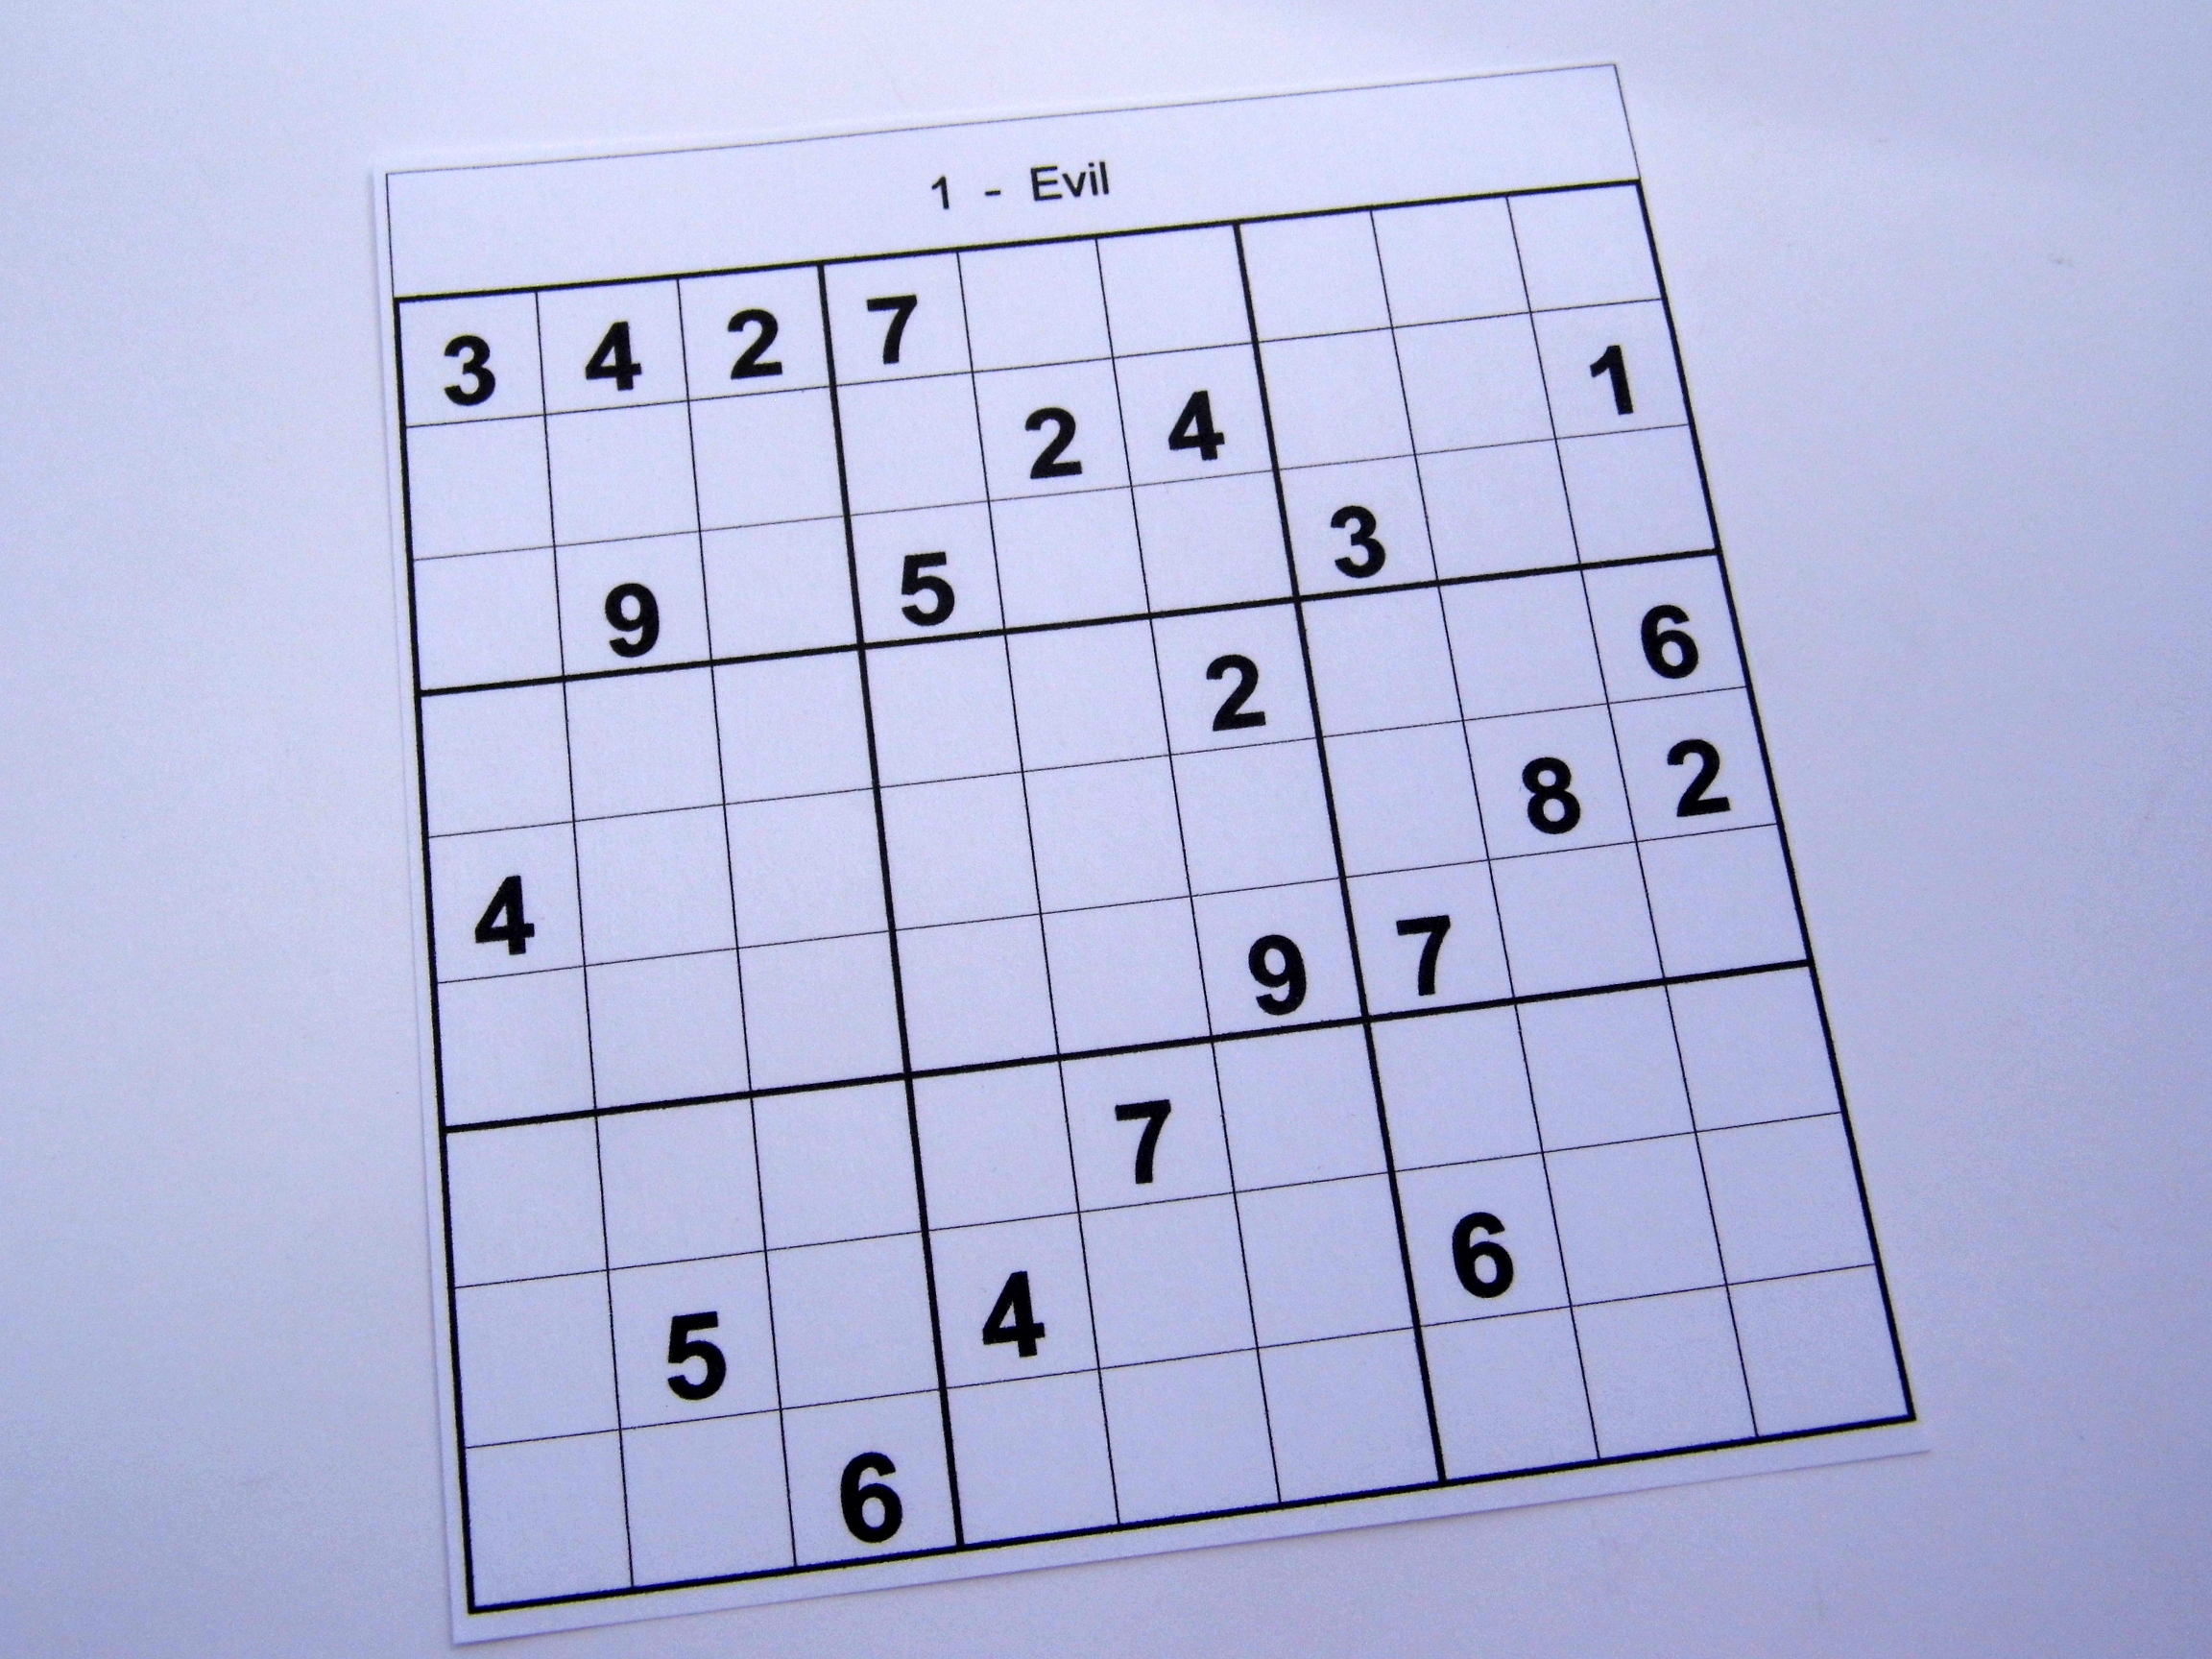 Hard Printable Sudoku Puzzles 2 Per Page – Book 1 – Free Sudoku Puzzles - Printable Sudoku Puzzle Hard